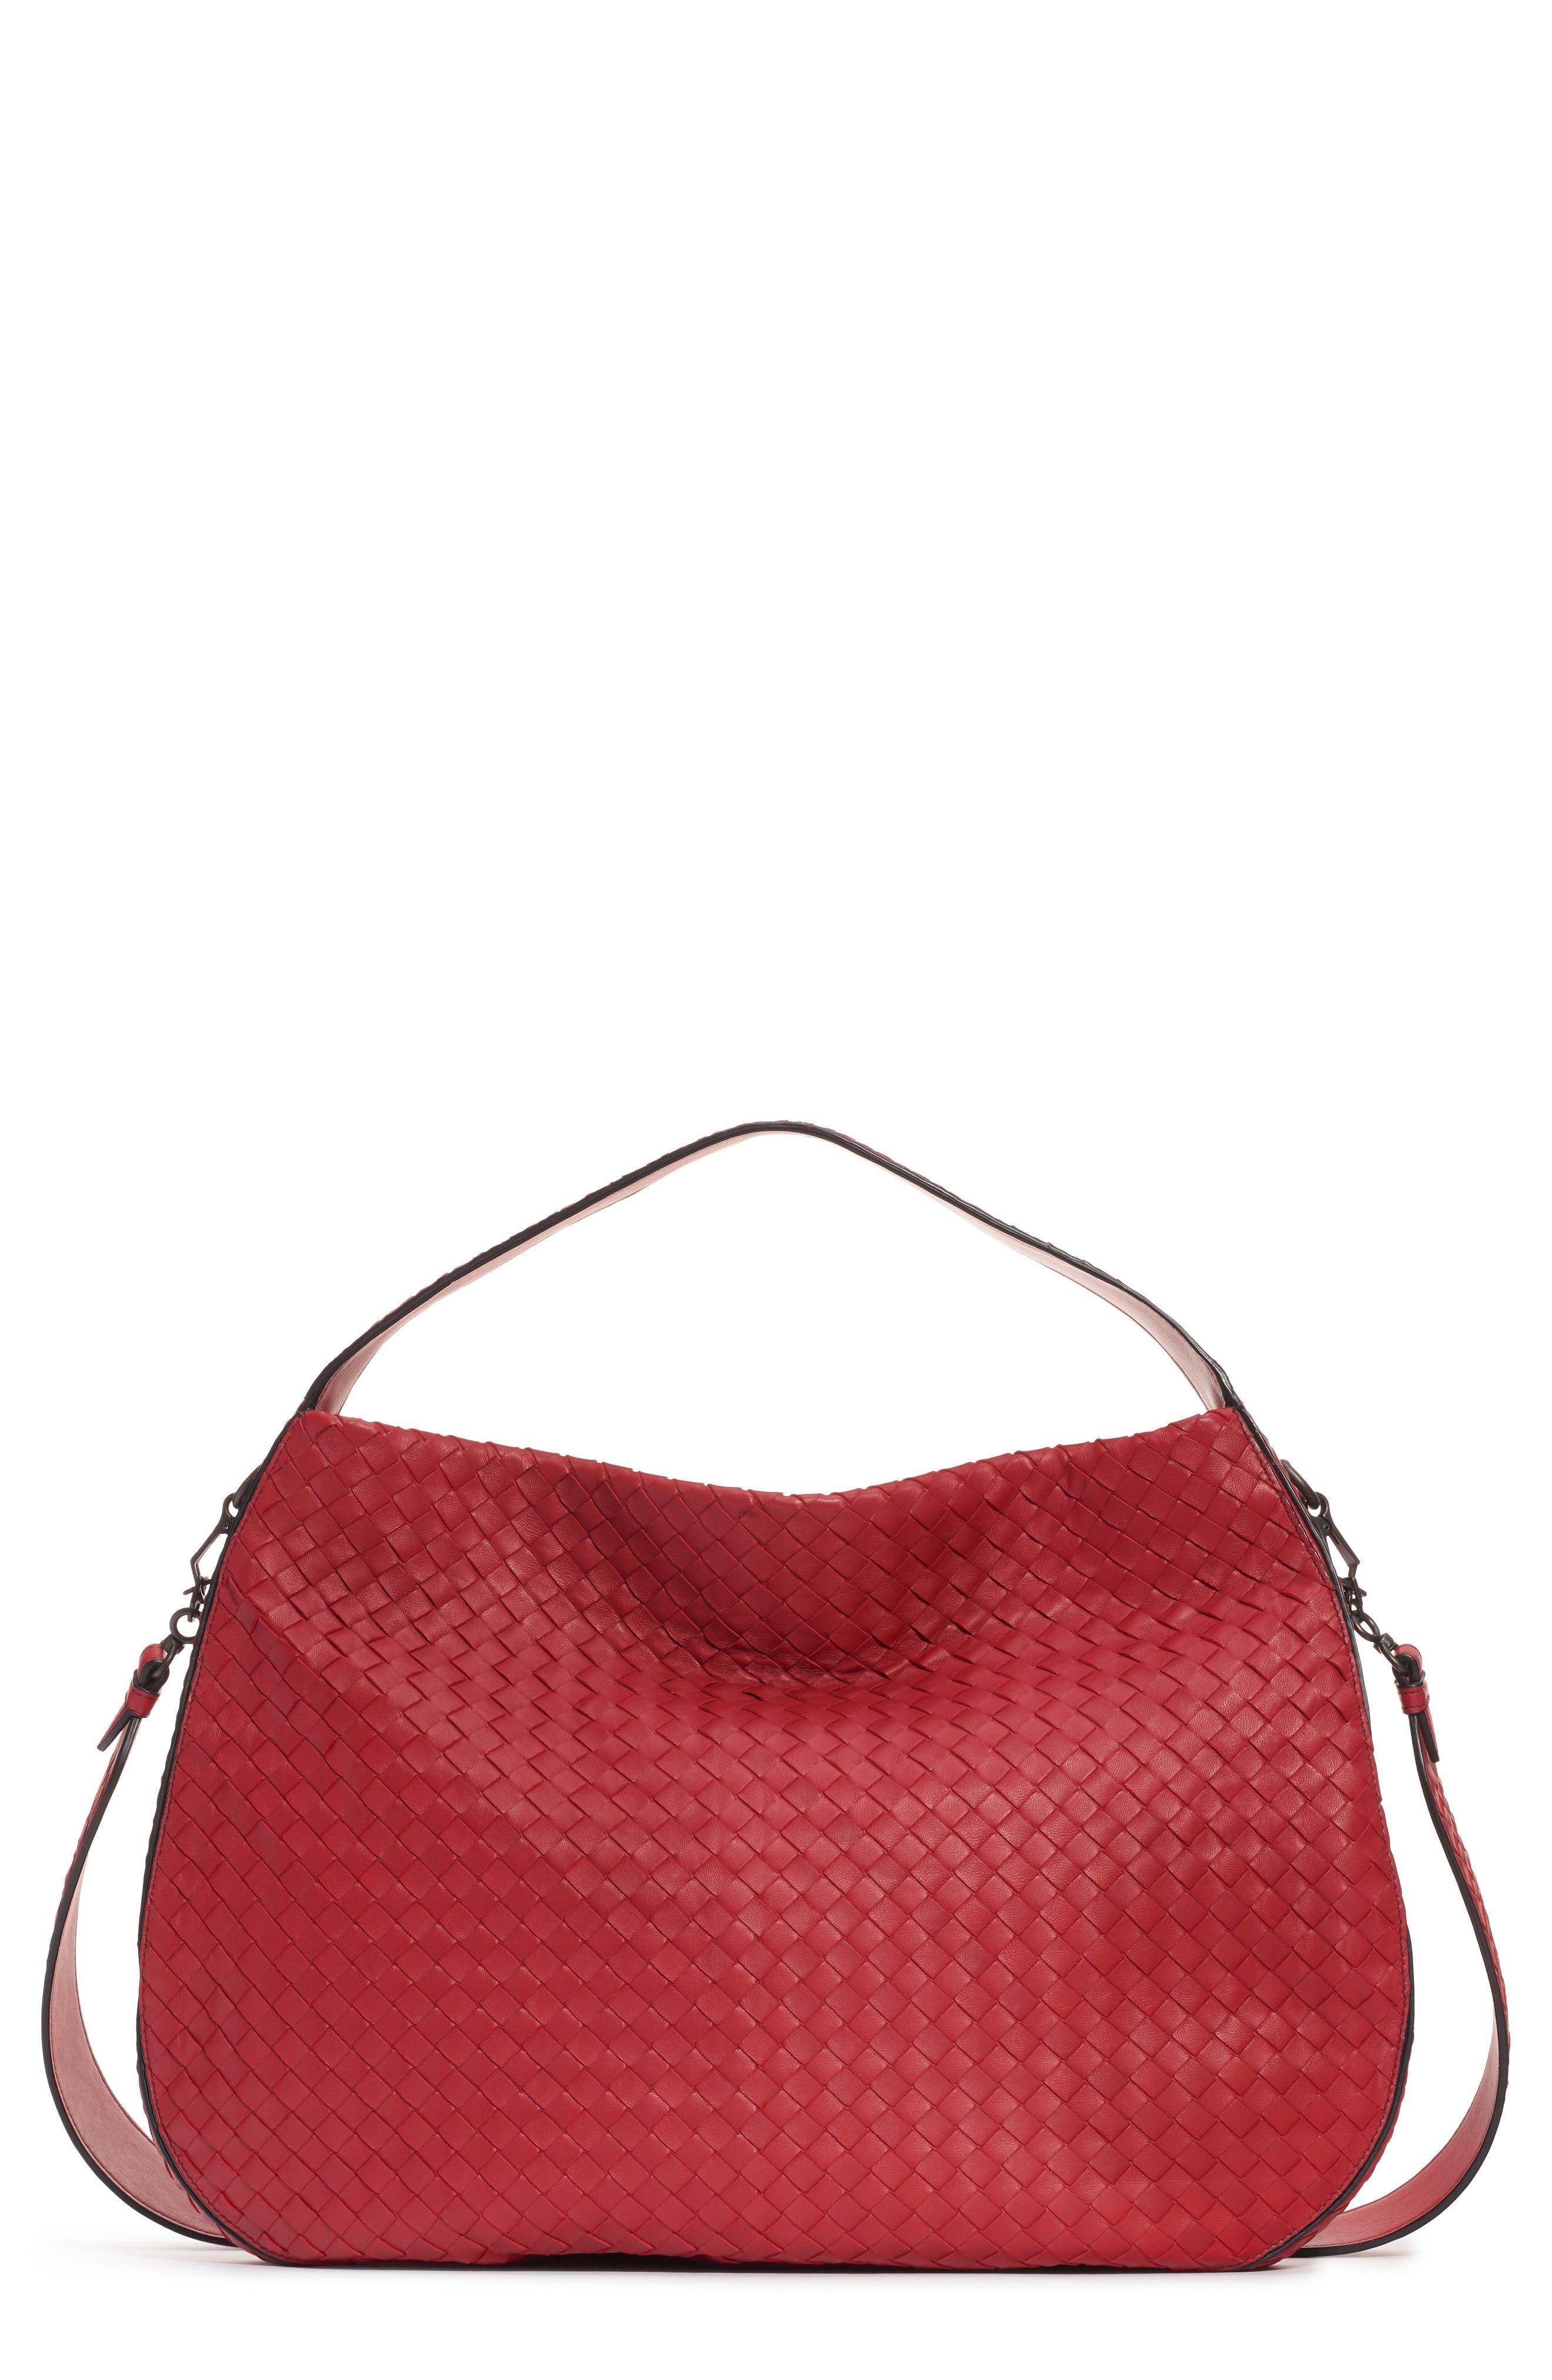 BOTTEGA VENETA, City Veneta Shoulder Bag, Main thumbnail 1, color, BACCARA RED-NERO/ BRUNITO